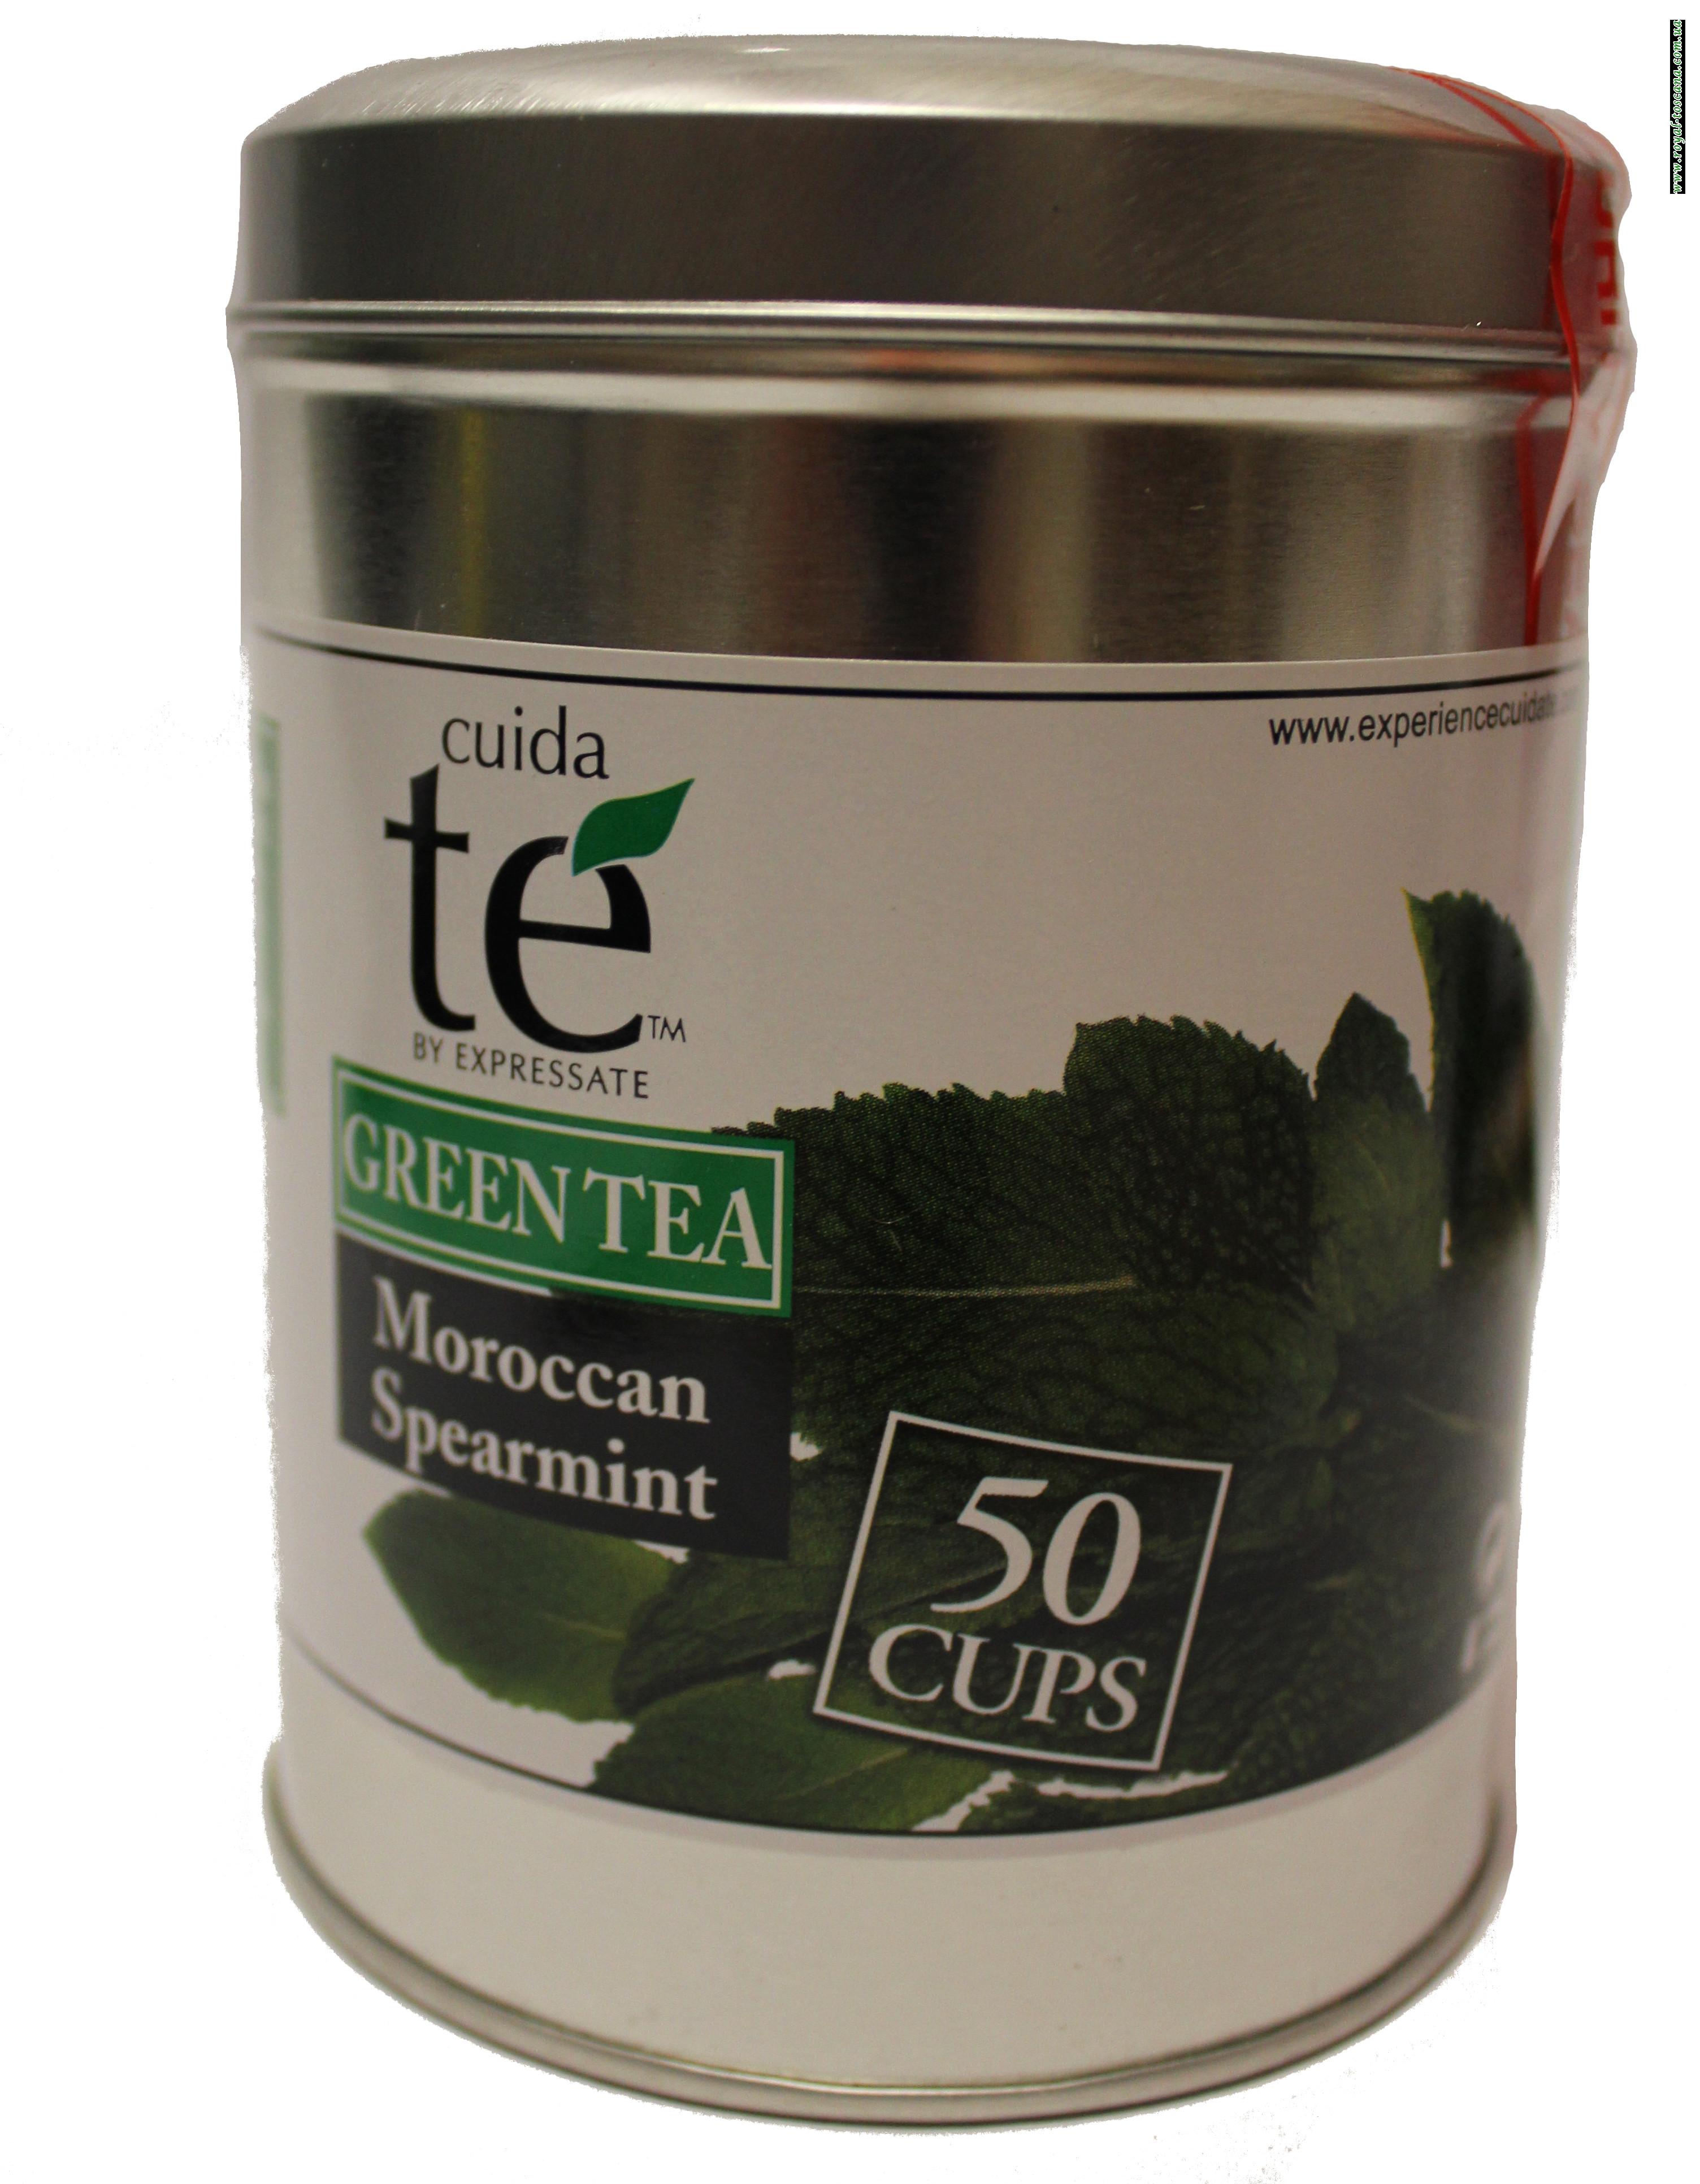 Зеленый чай Cuida Te Morocan Spearmint